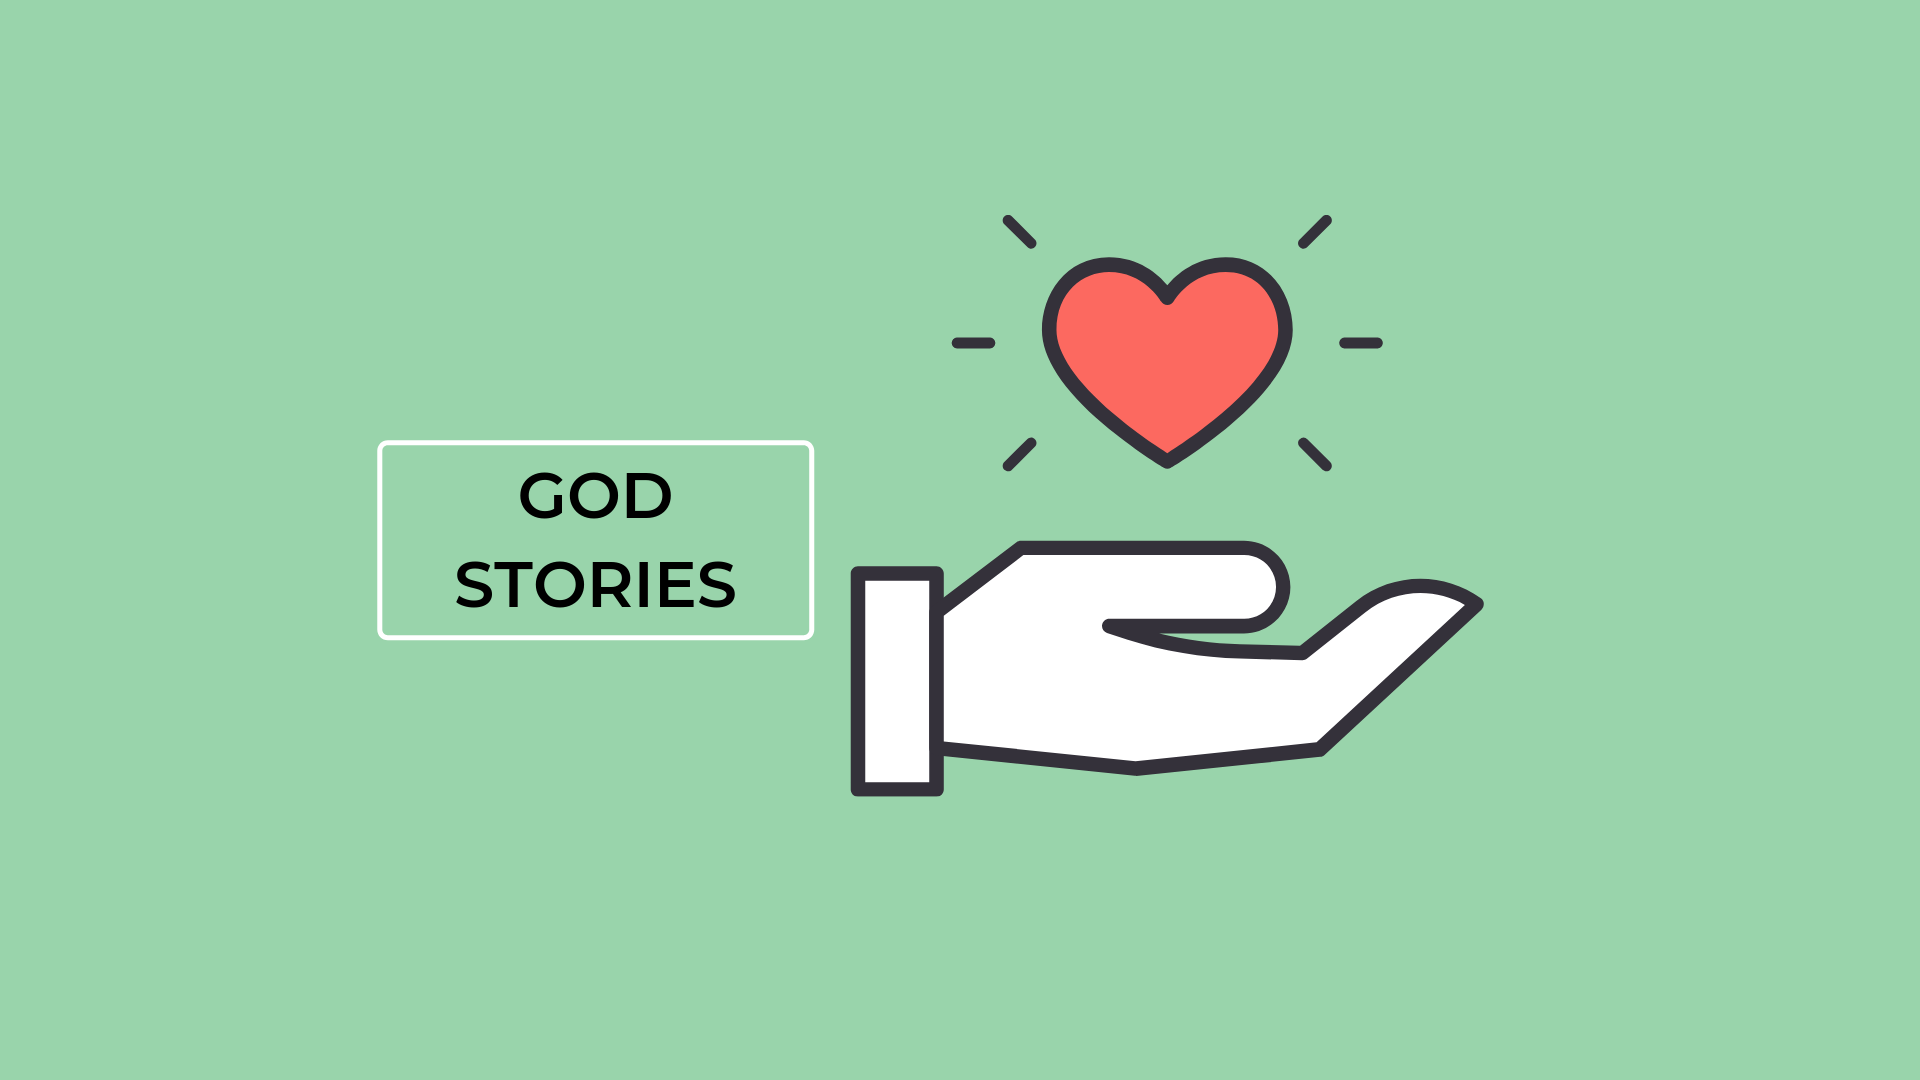 GOD STORIES (2).png